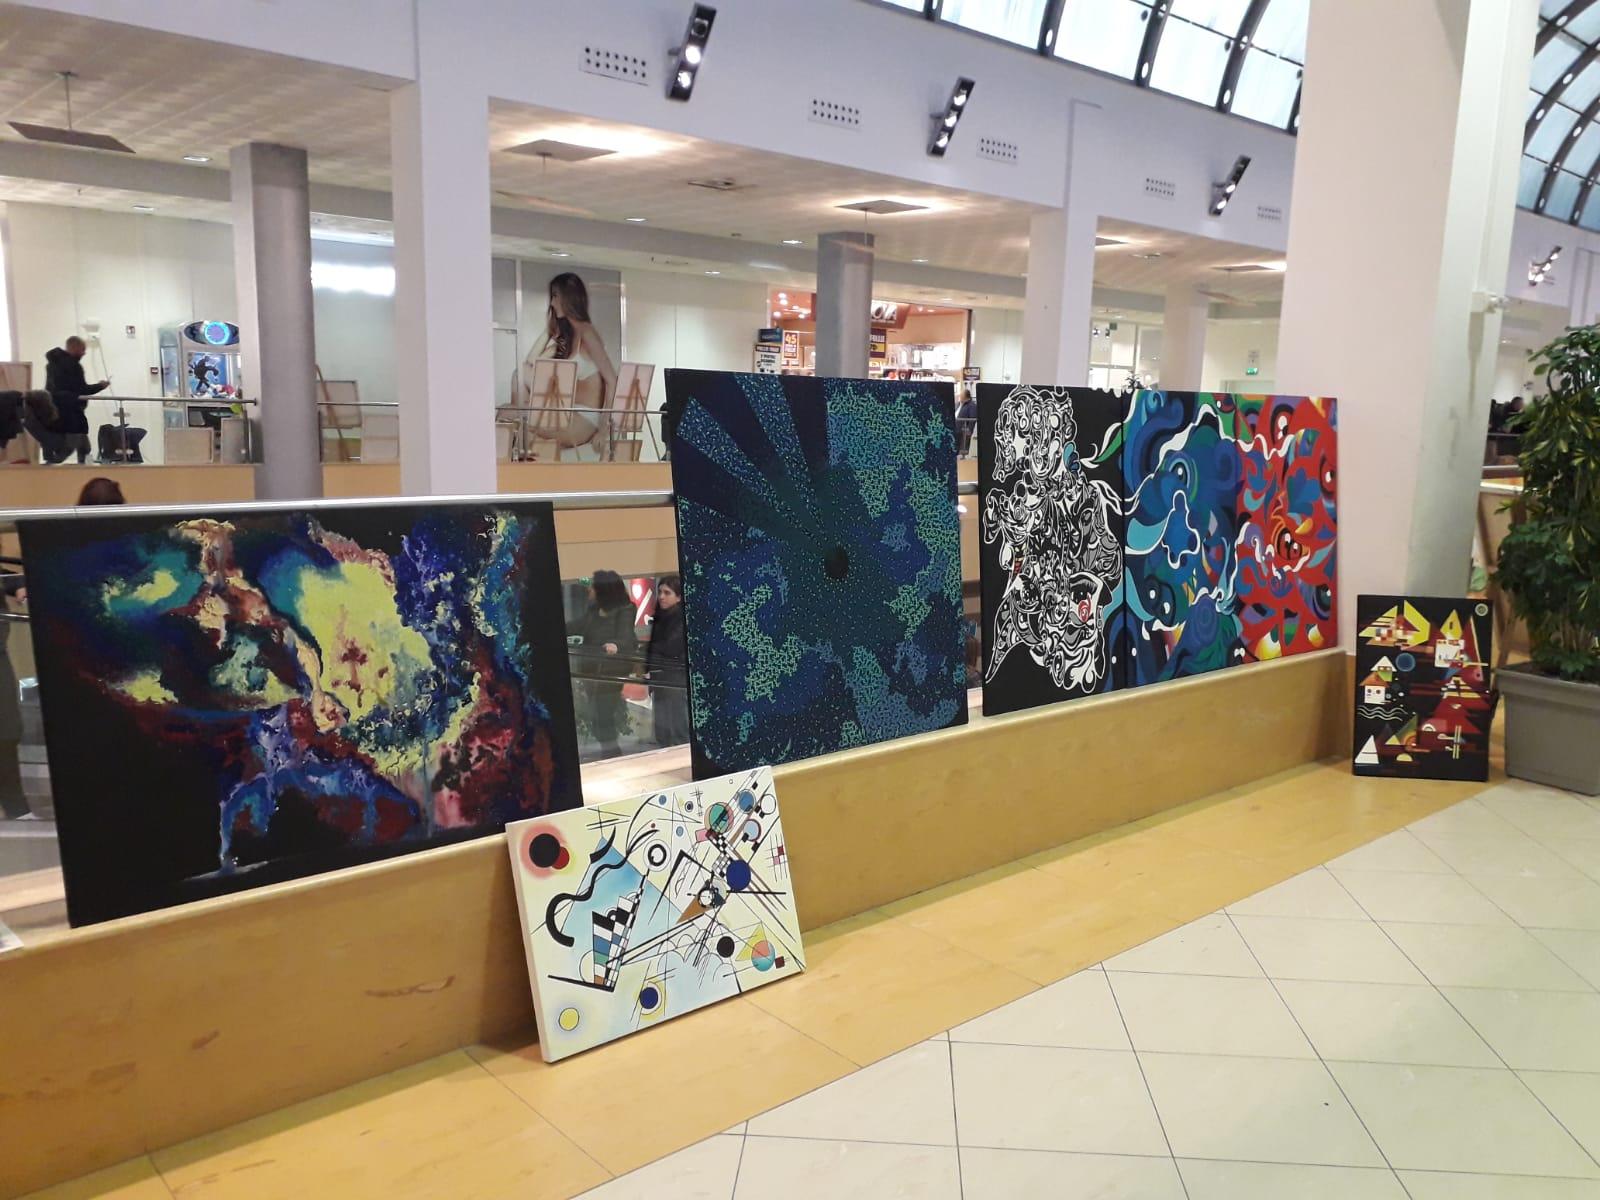 Mostra dipinti - Lisa ingoglia